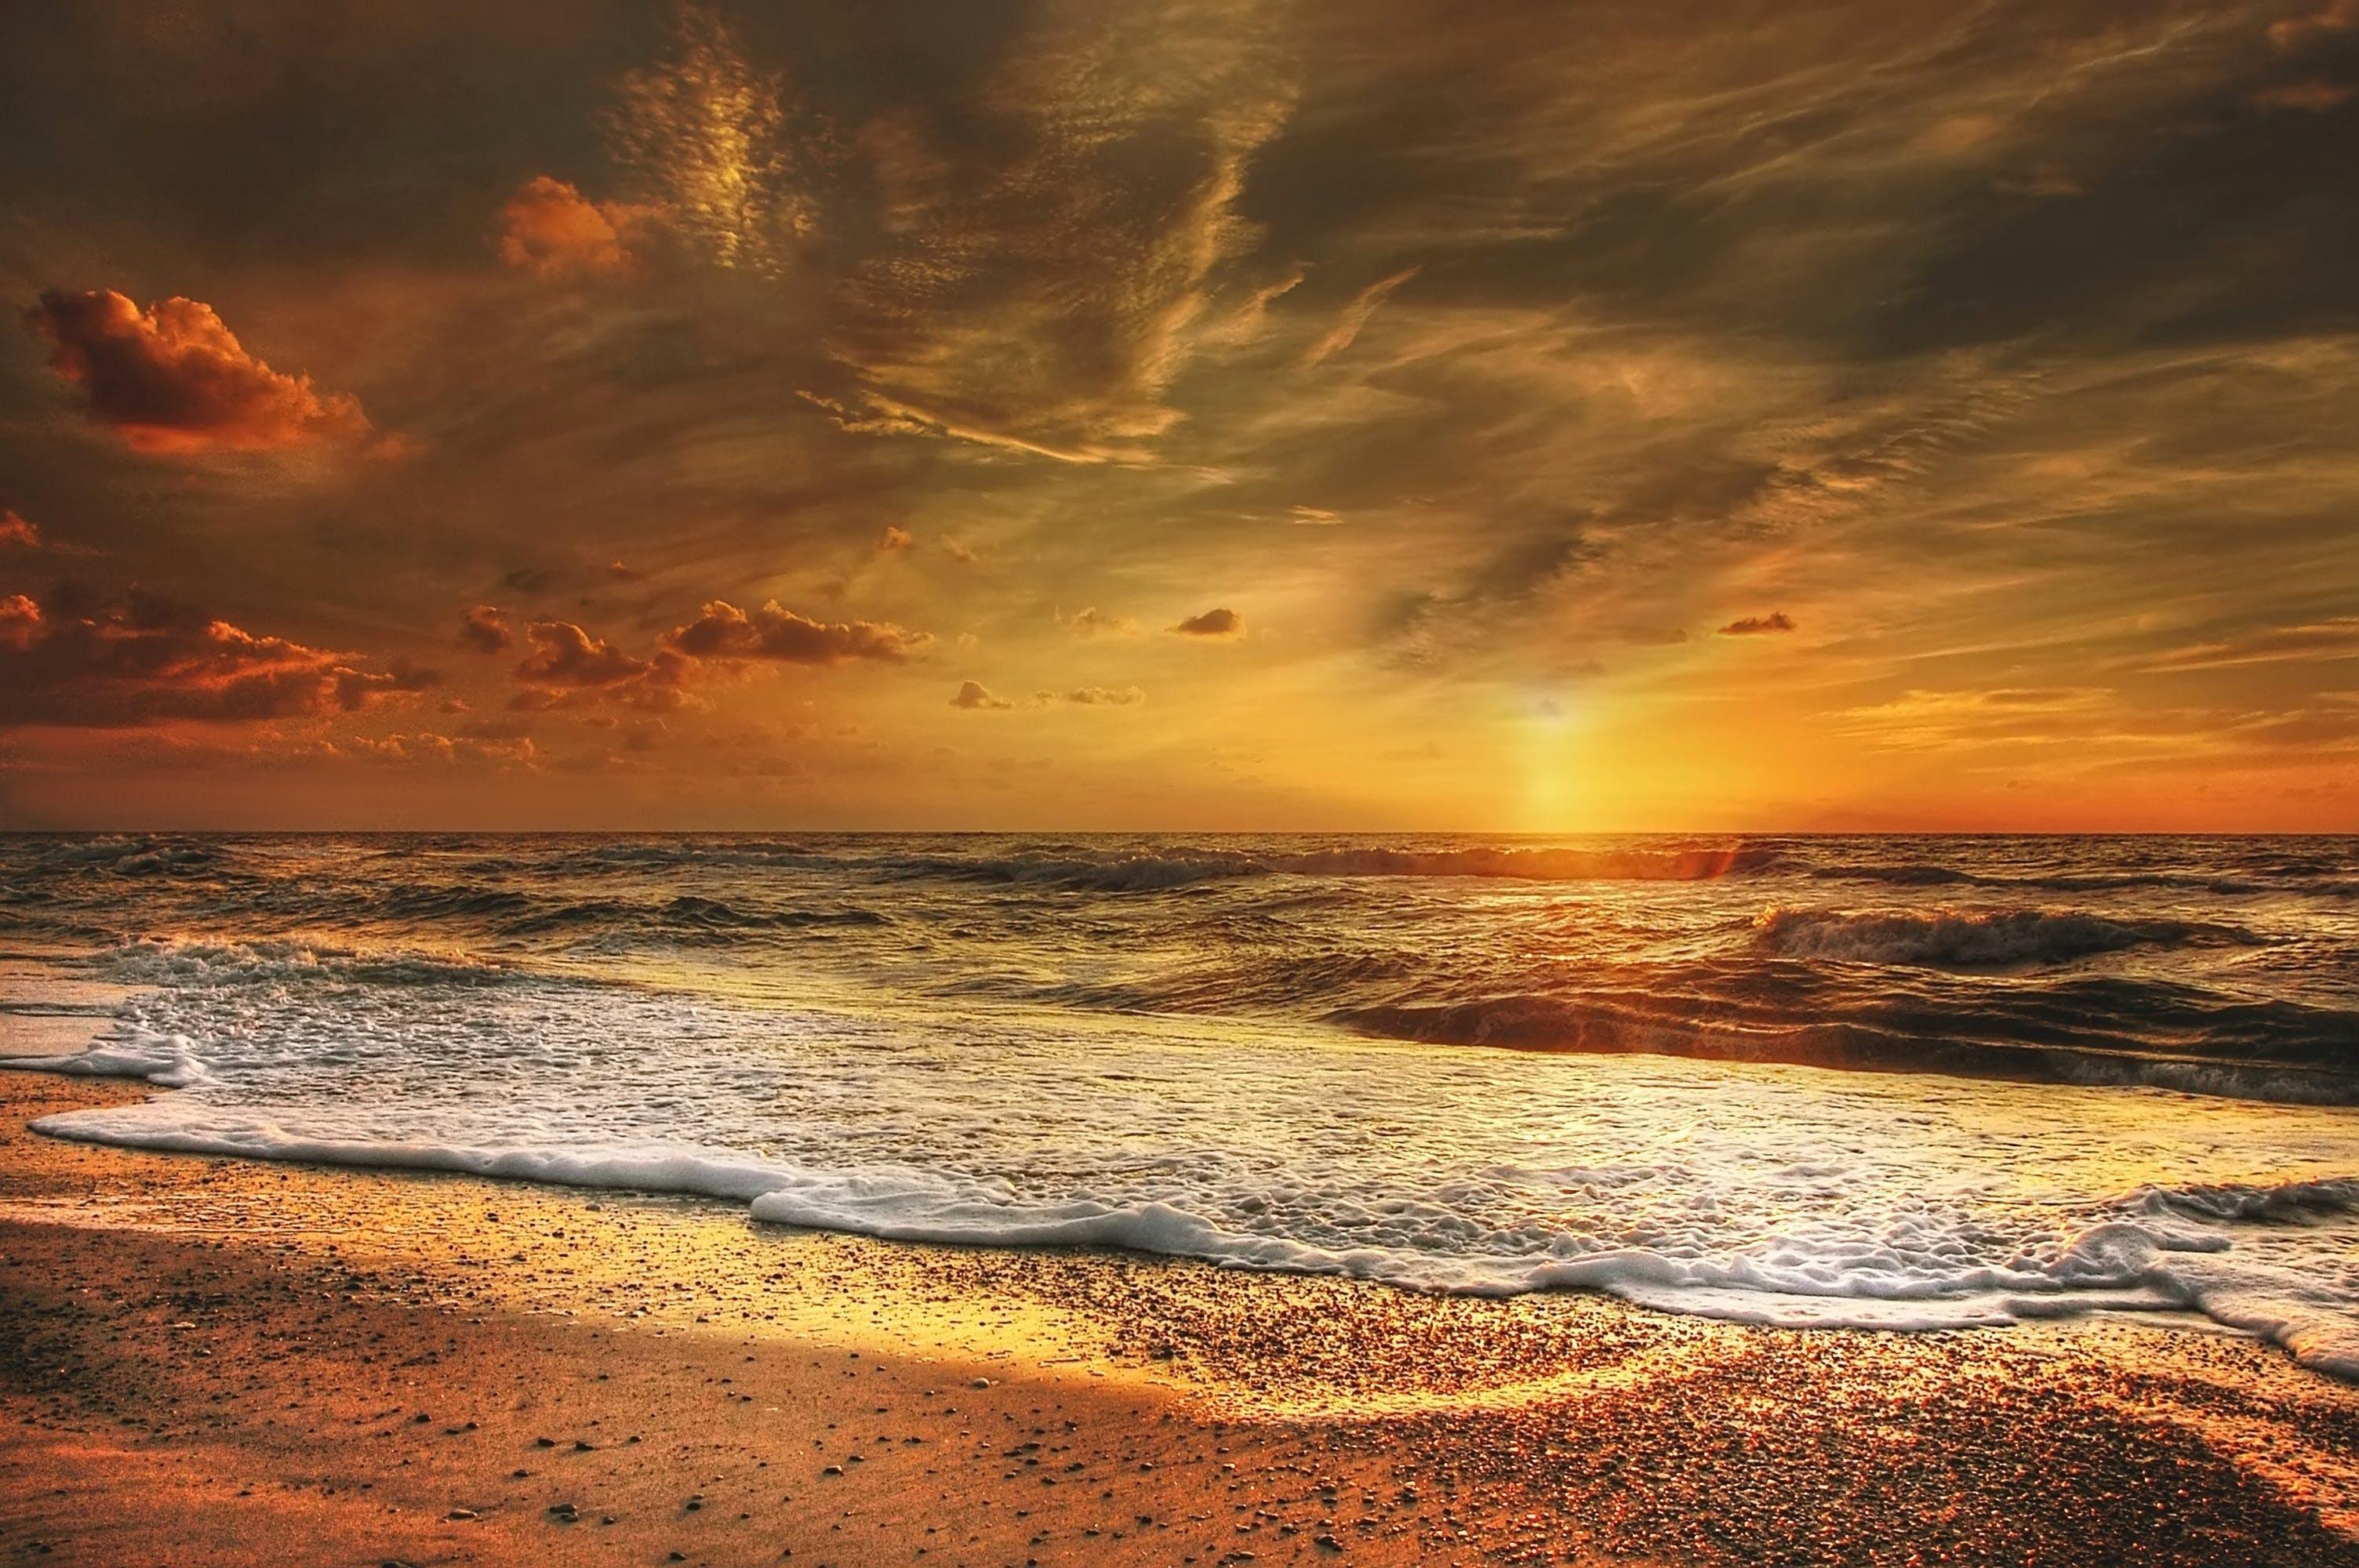 Sunset Seashore Waves